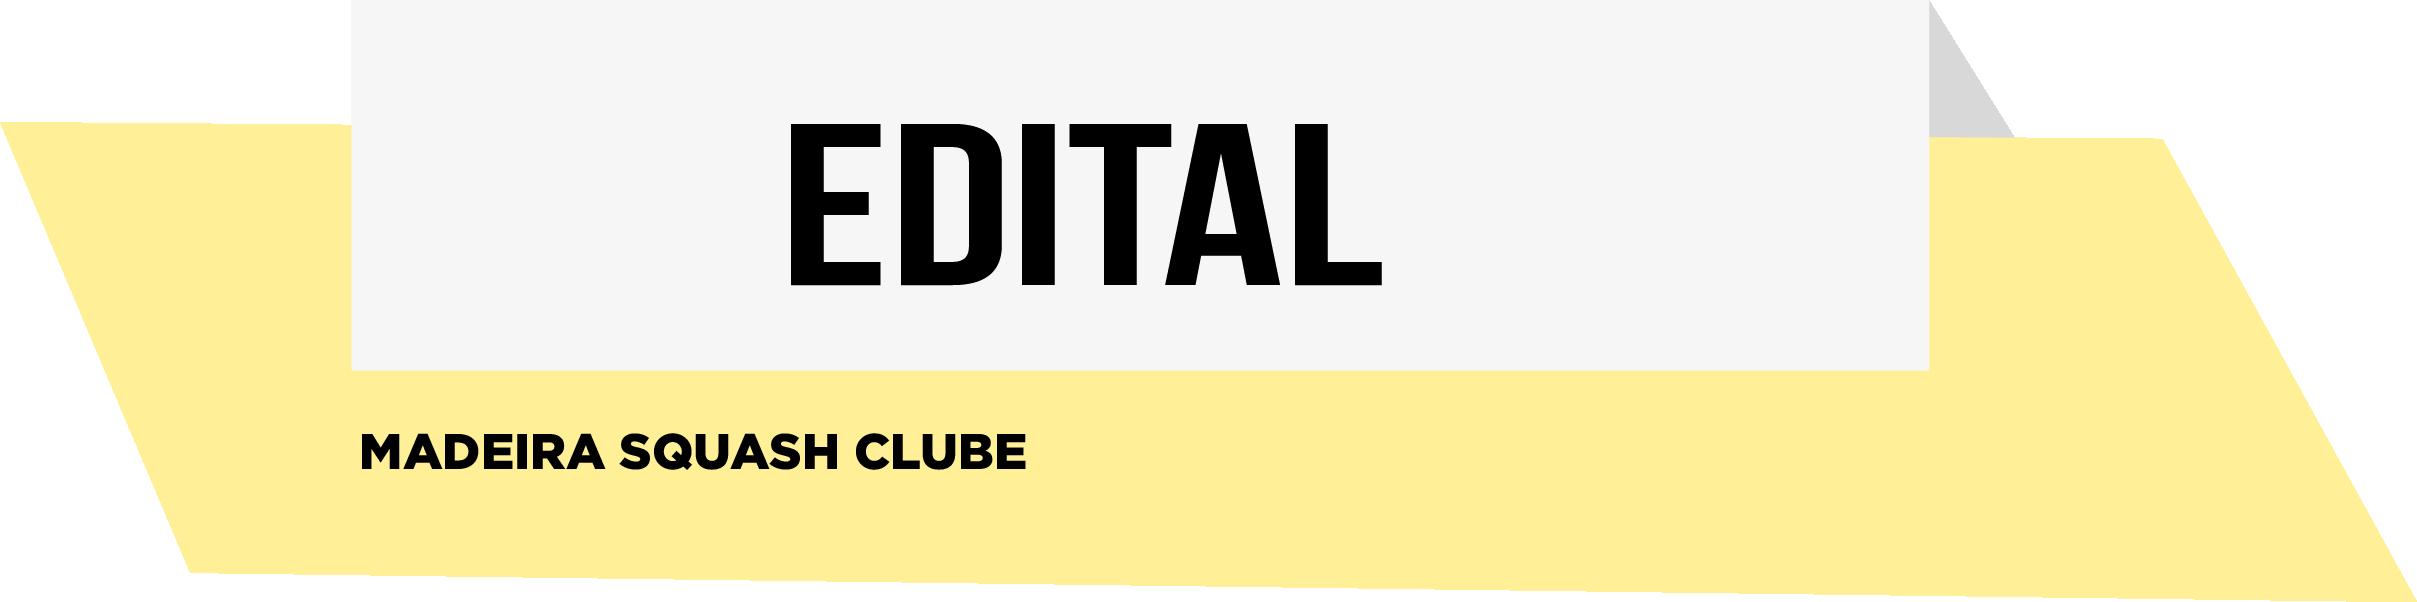 EDITAL- Madeira Squash Clube